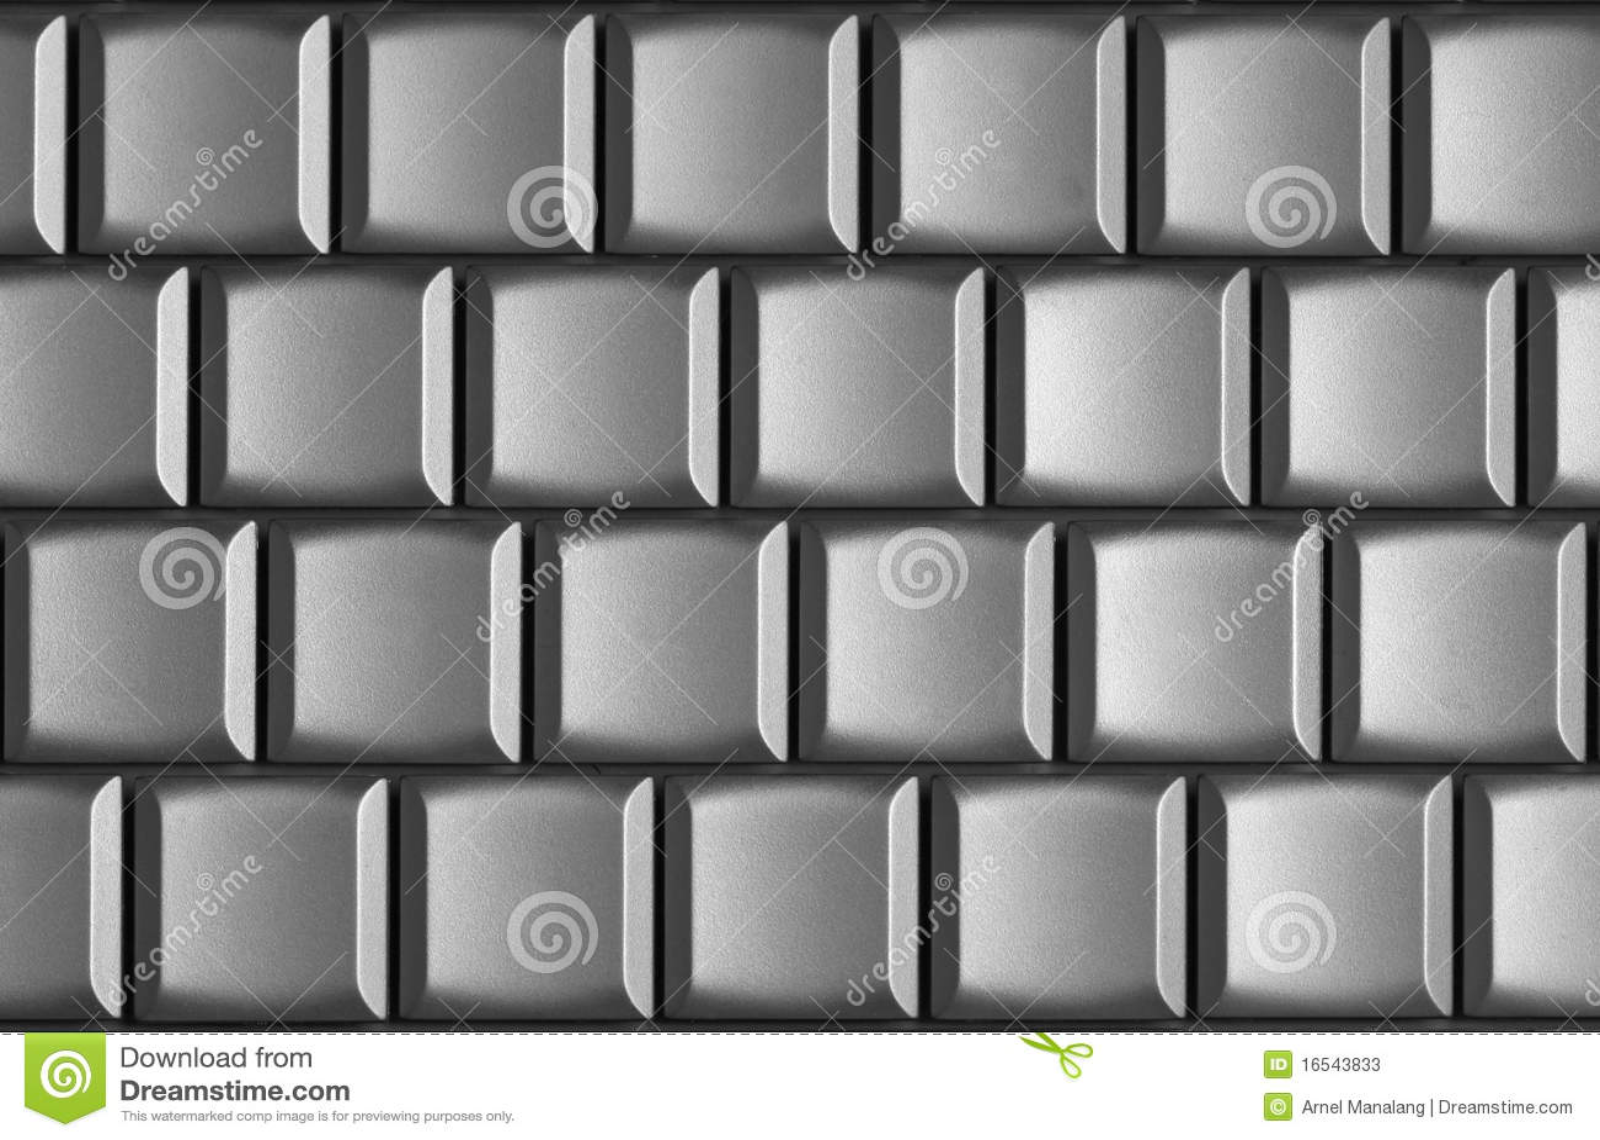 Blank Computer Keyboard Stock Image Image Of Laptop